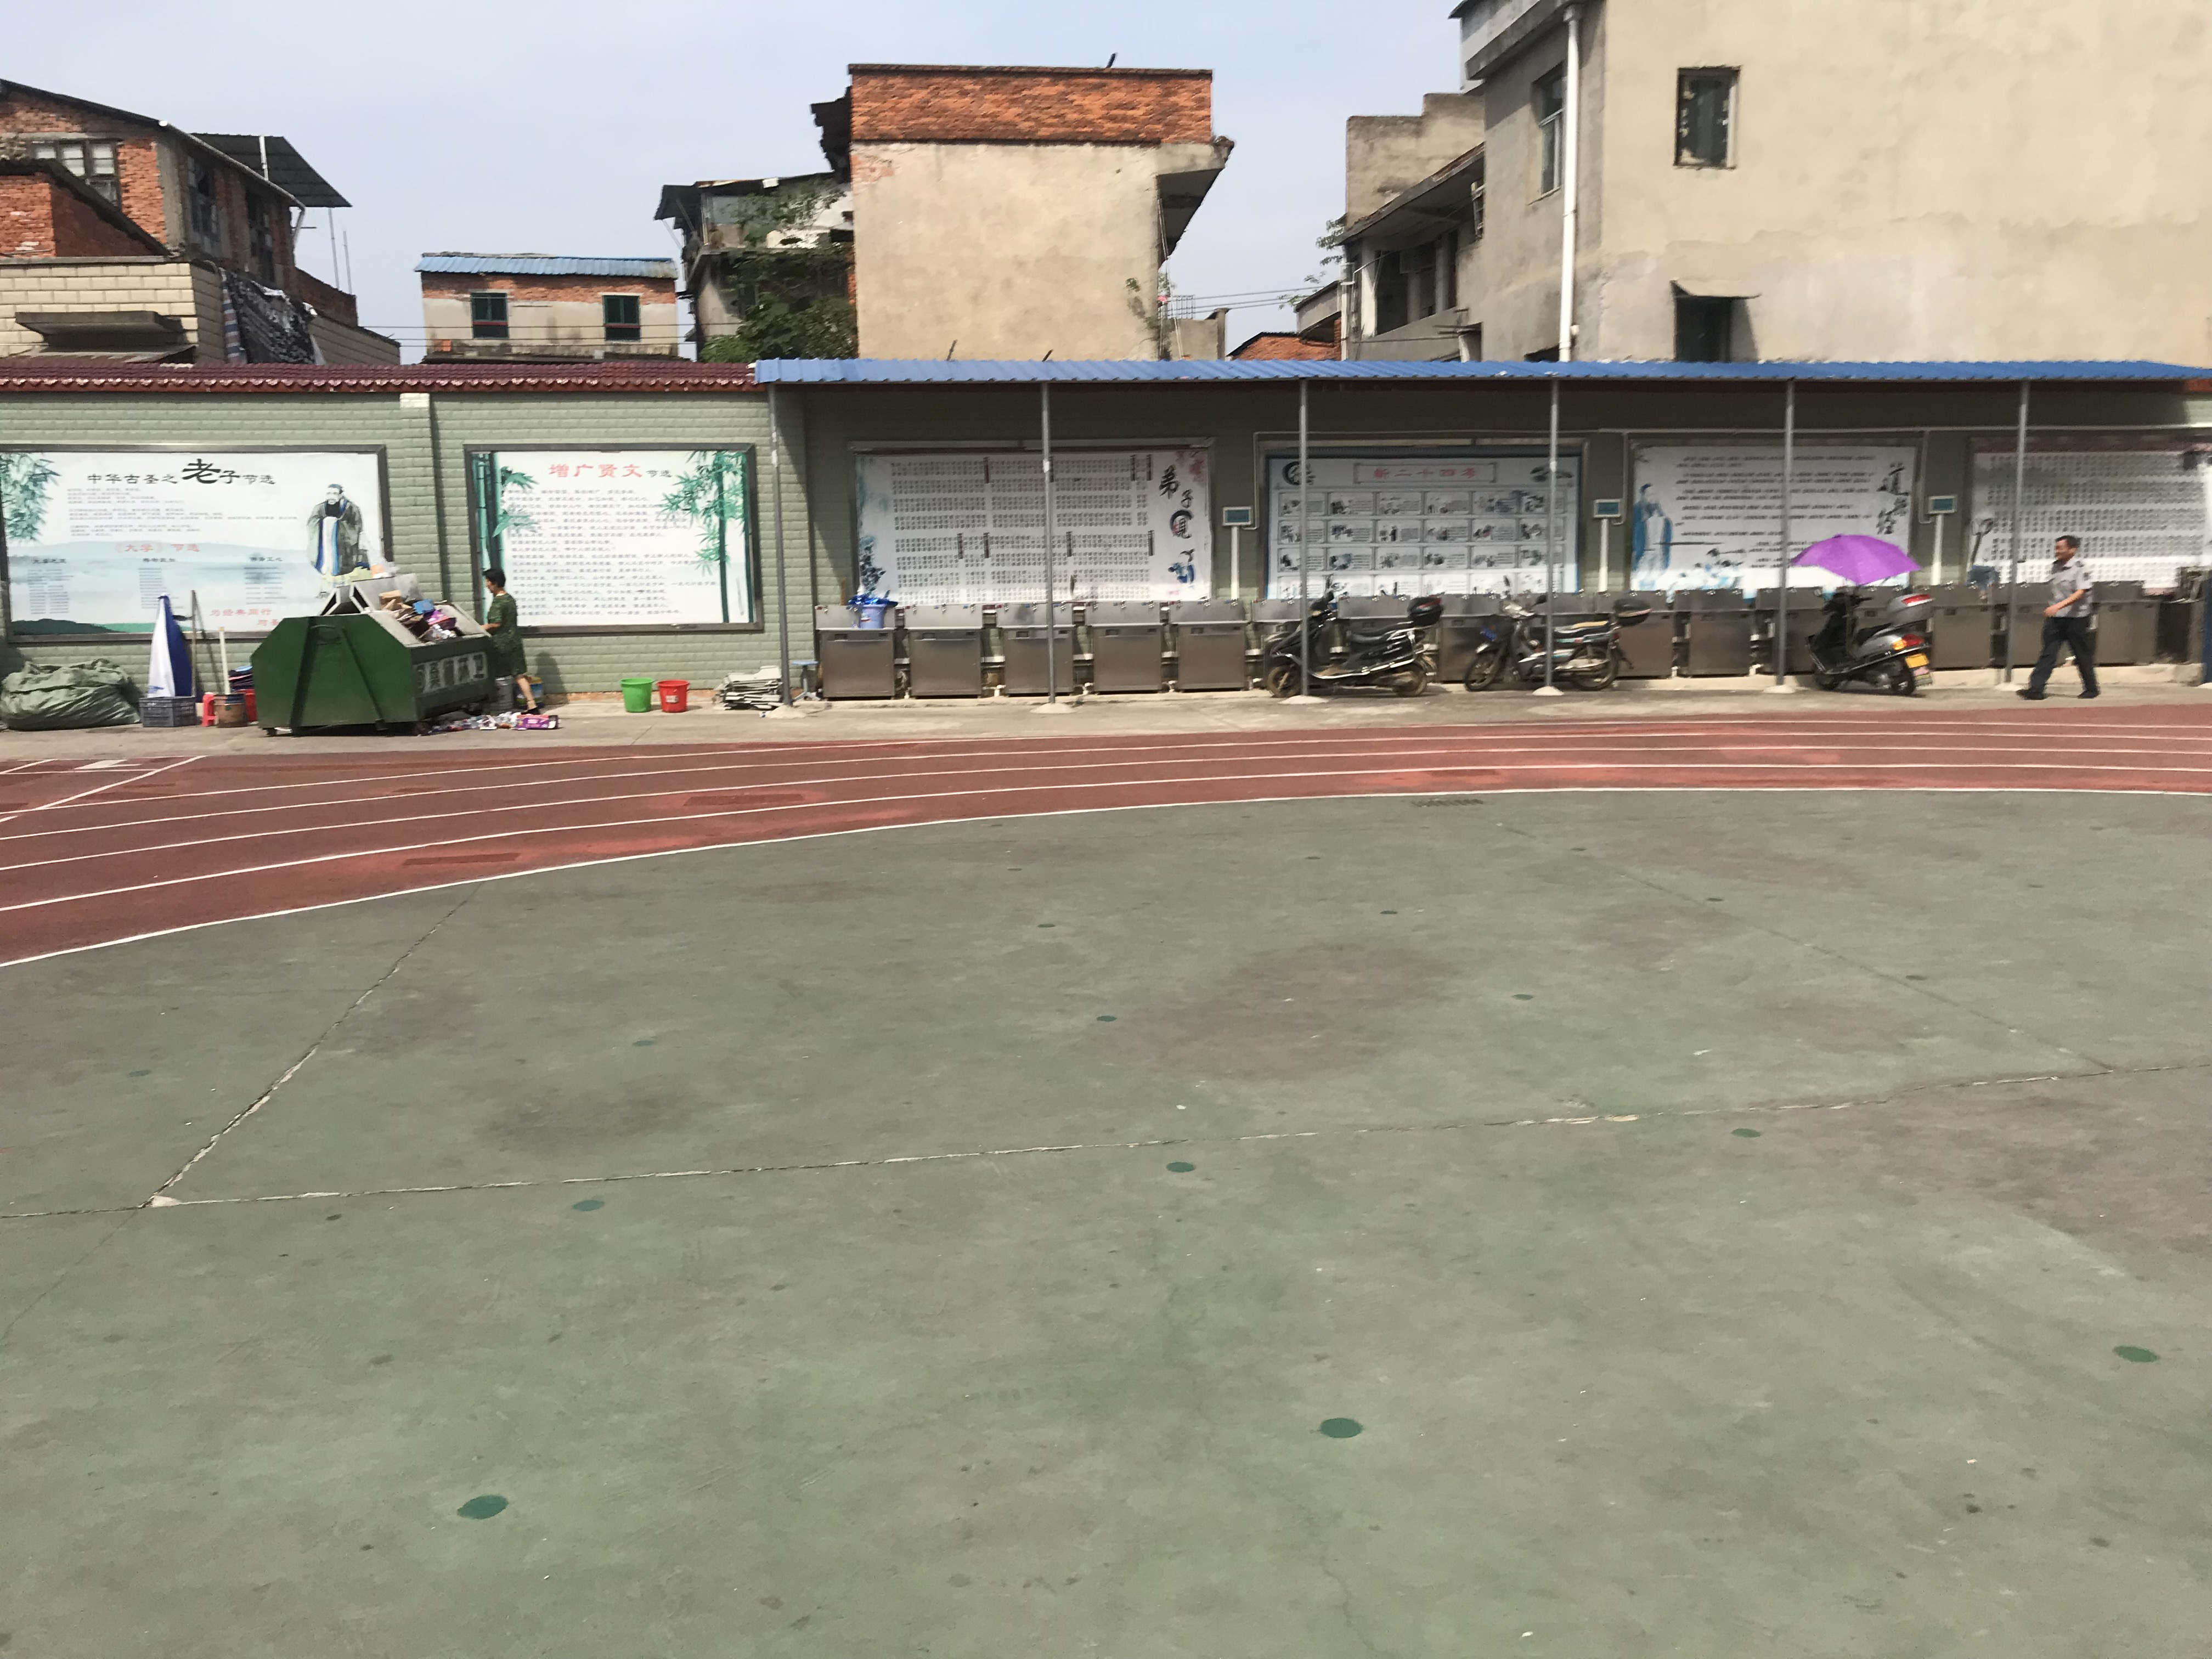 m6电竞市第二小学校园文化建设(图75)